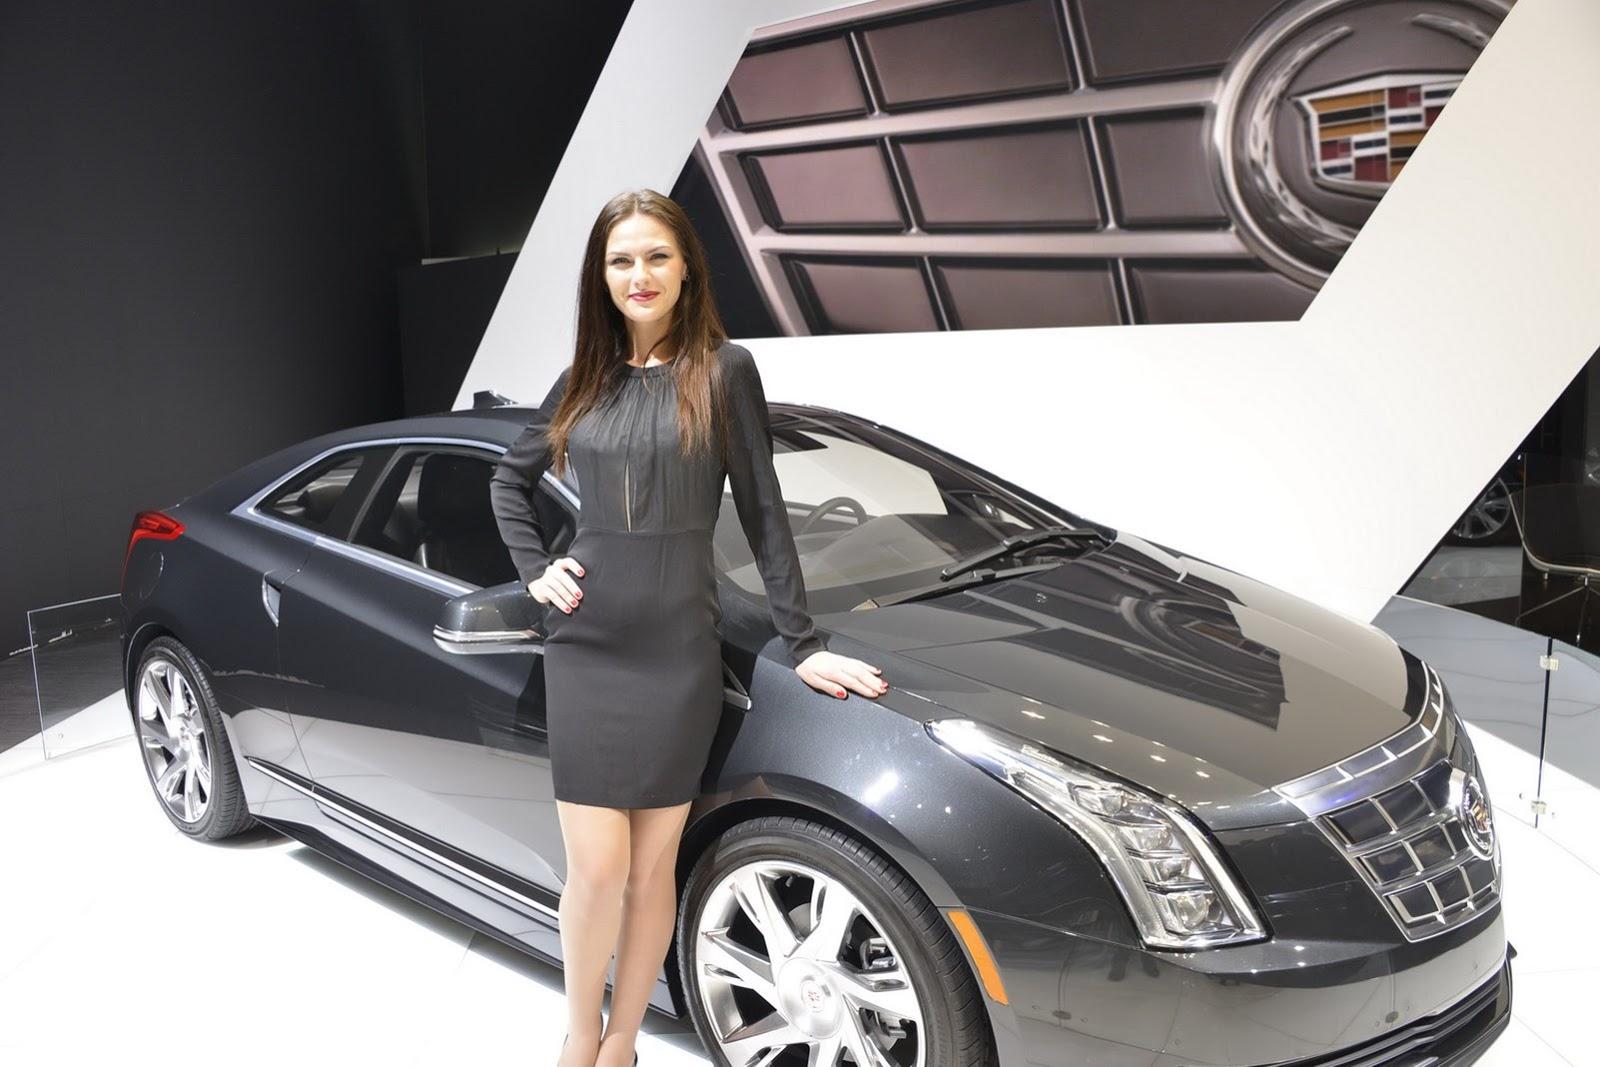 Hot girls of the geneva motor show - Auto motor show ...